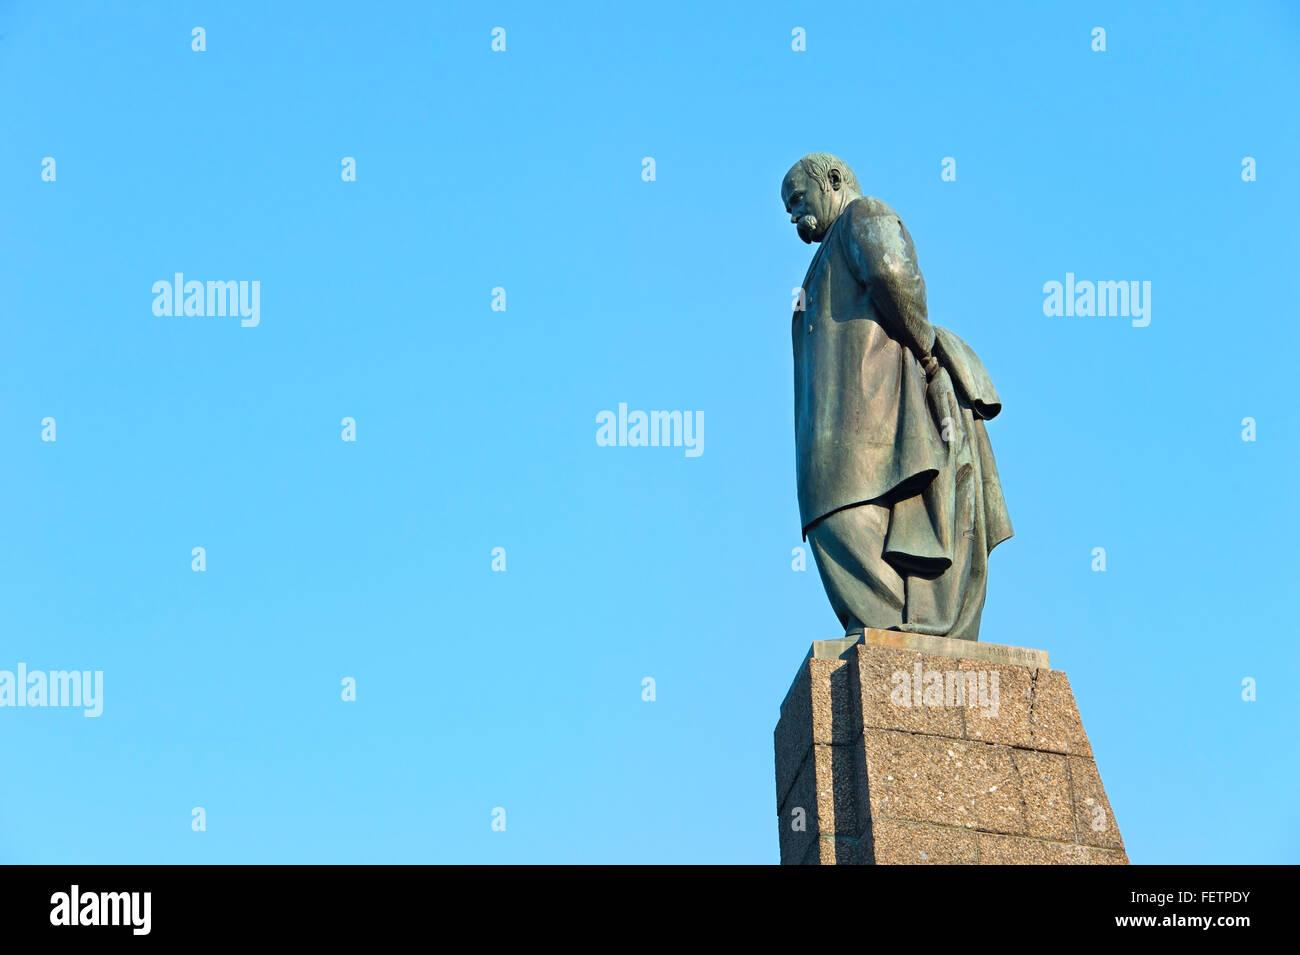 Taras Shevchenko monument in Kaniv, Ukraine. Taras Shevchenko was a Ukrainian poet, writer, artist, public and political - Stock Image